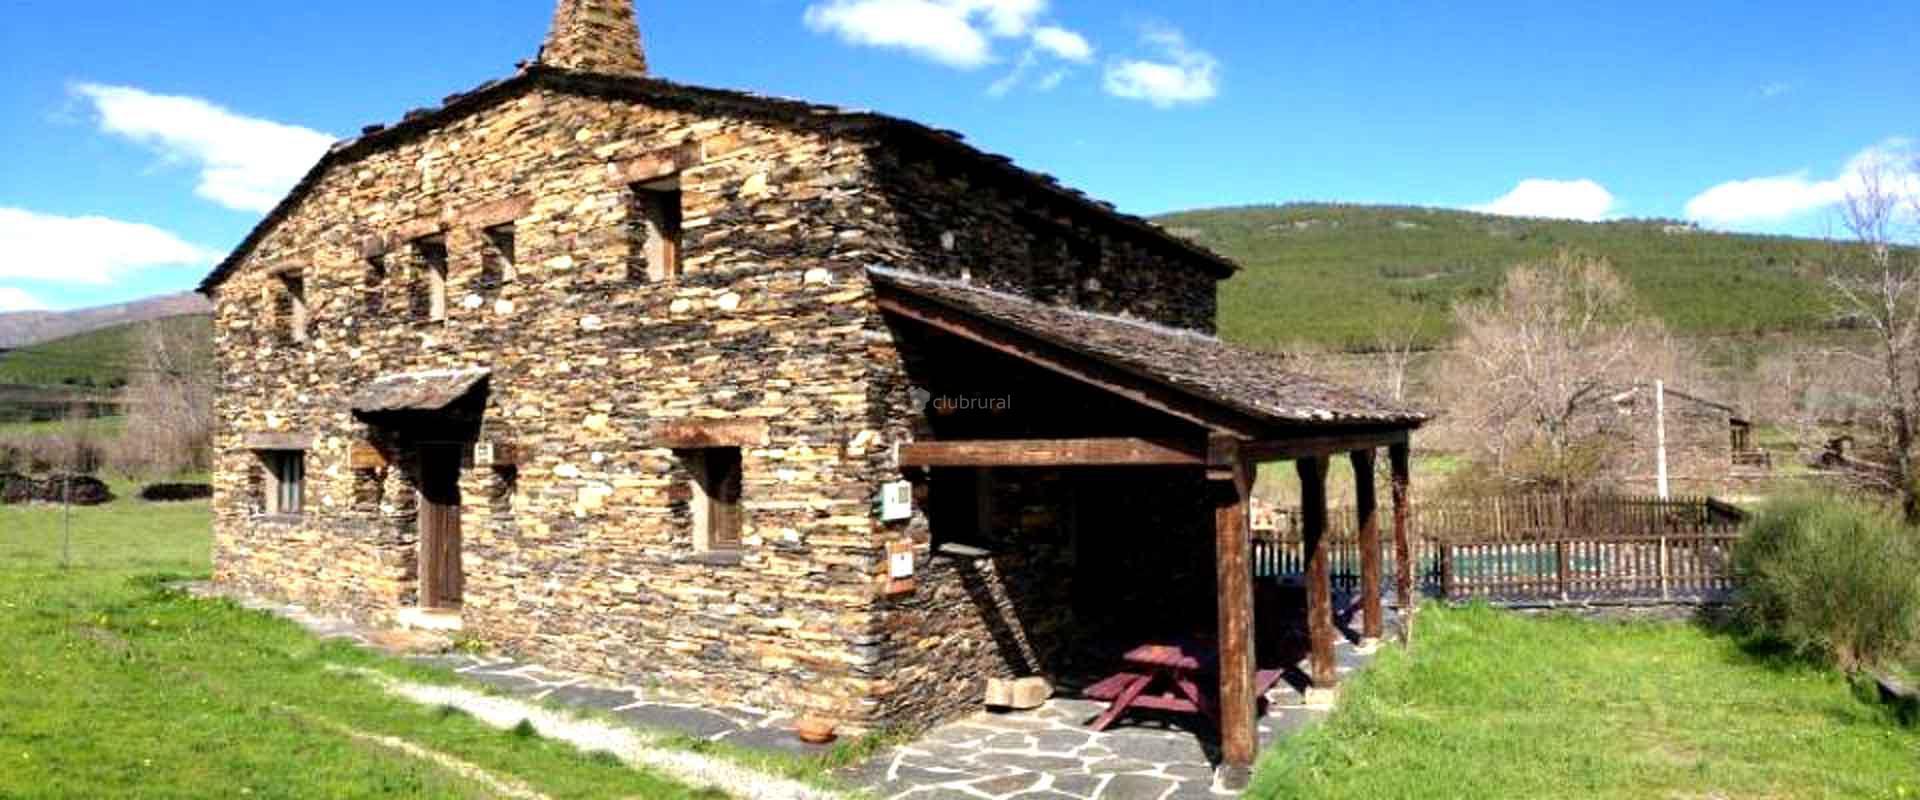 Fotos de casa rural la pizarra negra guadalajara - Casas rurales en la provenza ...